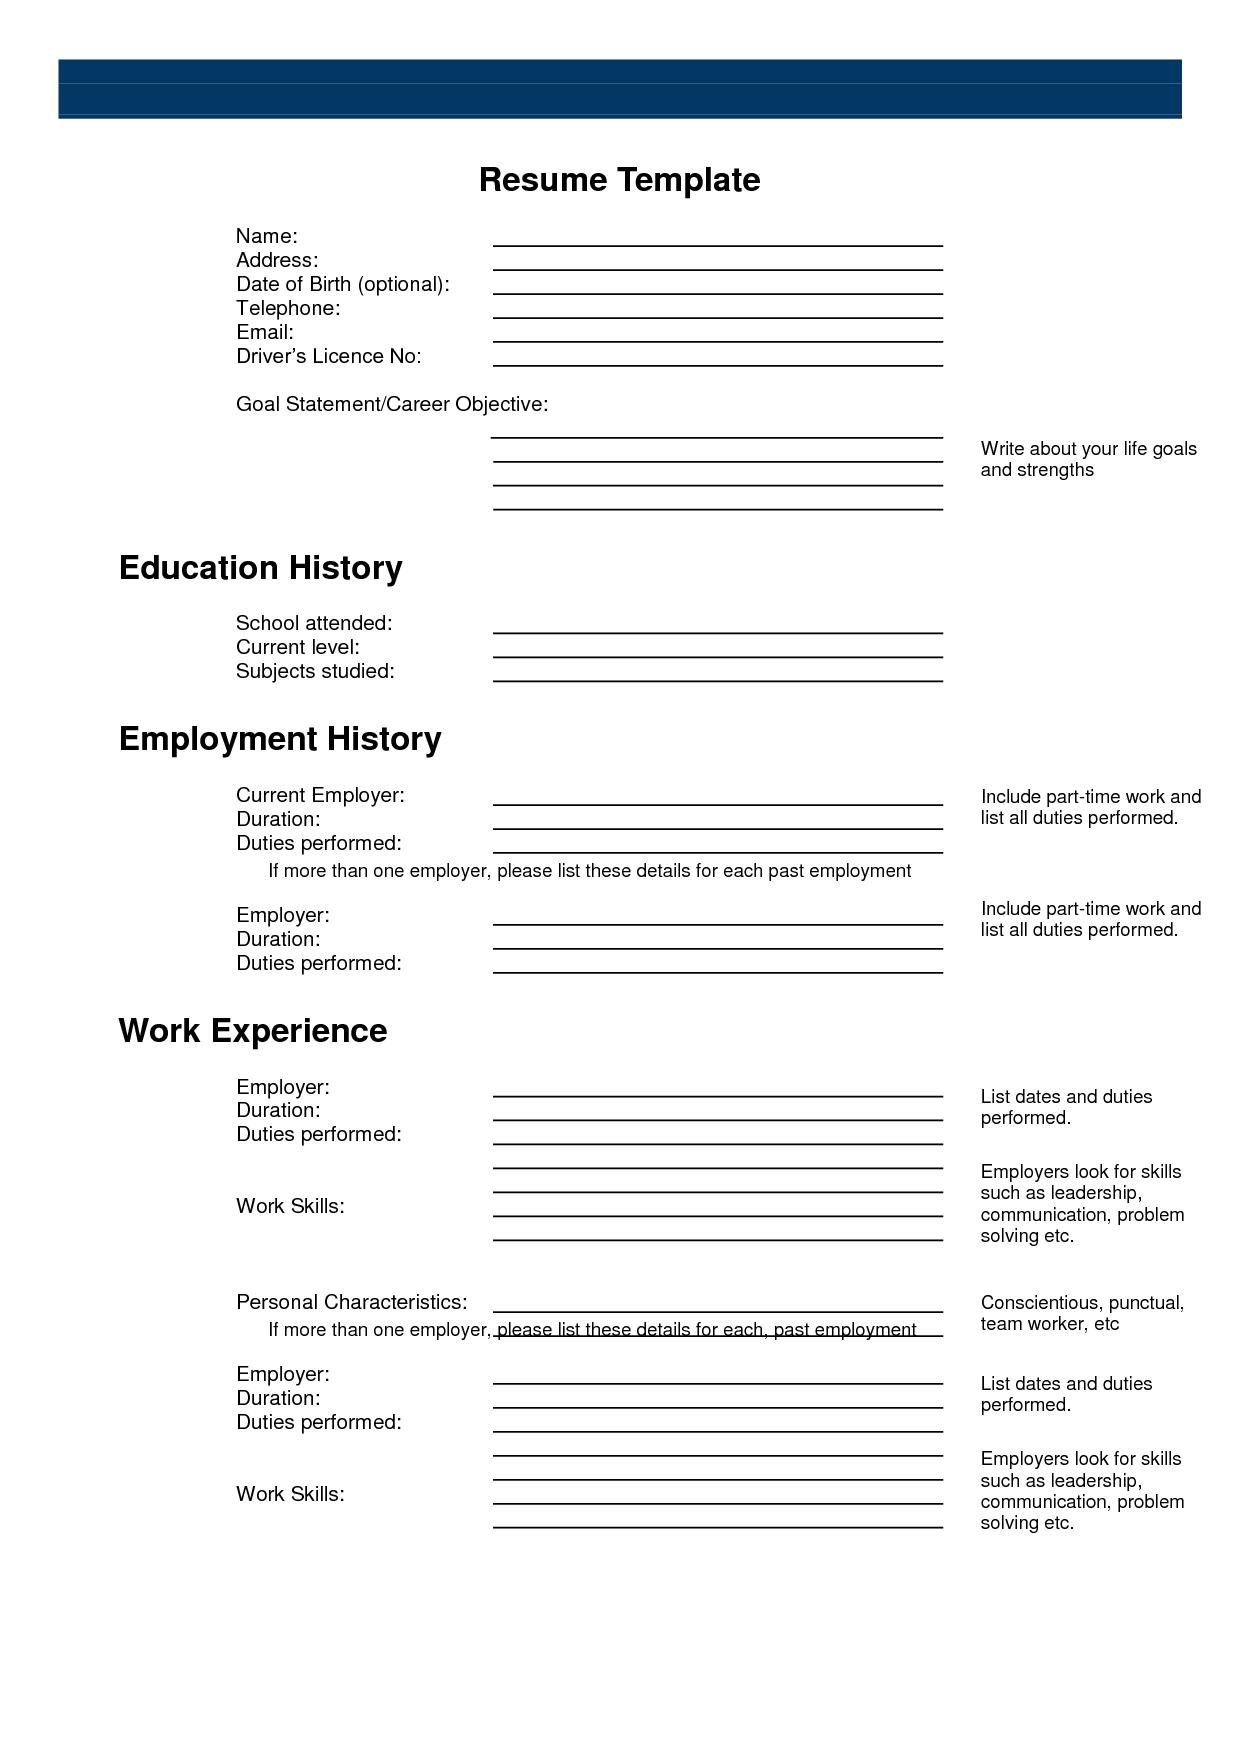 Free Printable Sample Resume Templates Httpwwwresumecareer Free - Free Printable Fill In The Blank Resume Templates